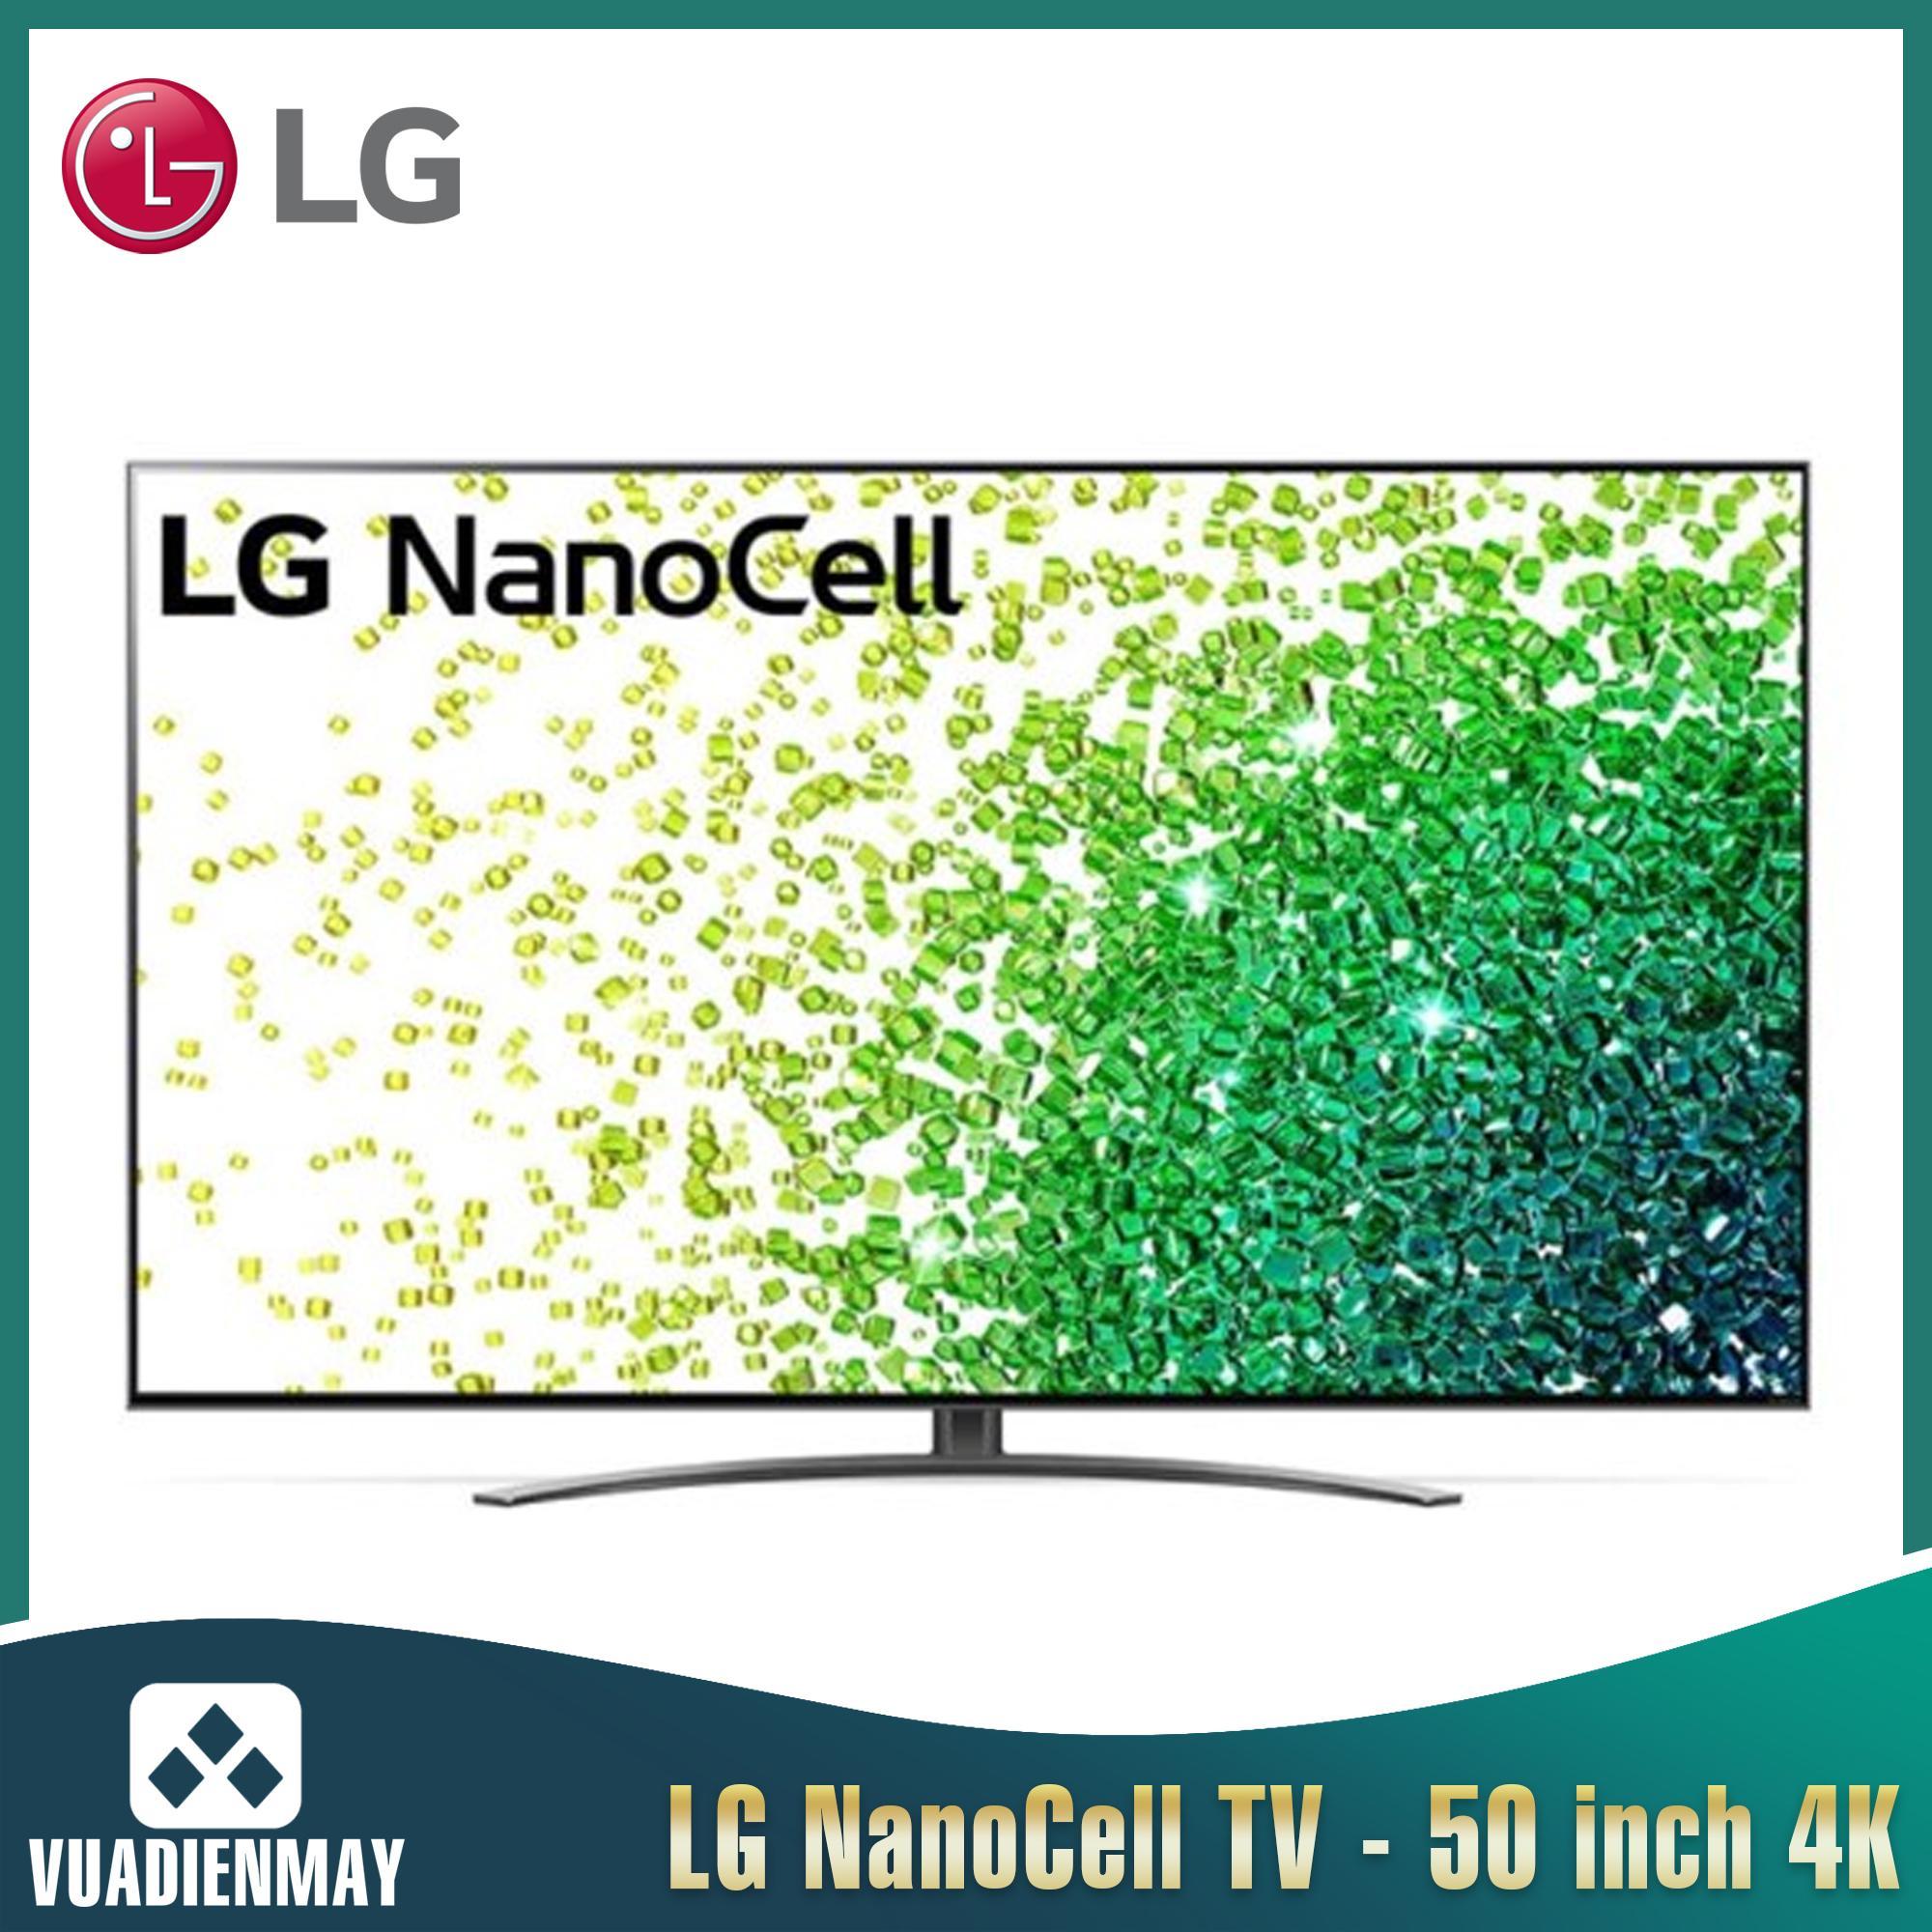 Smart Tivi NanoCell LG 4K 50 inch